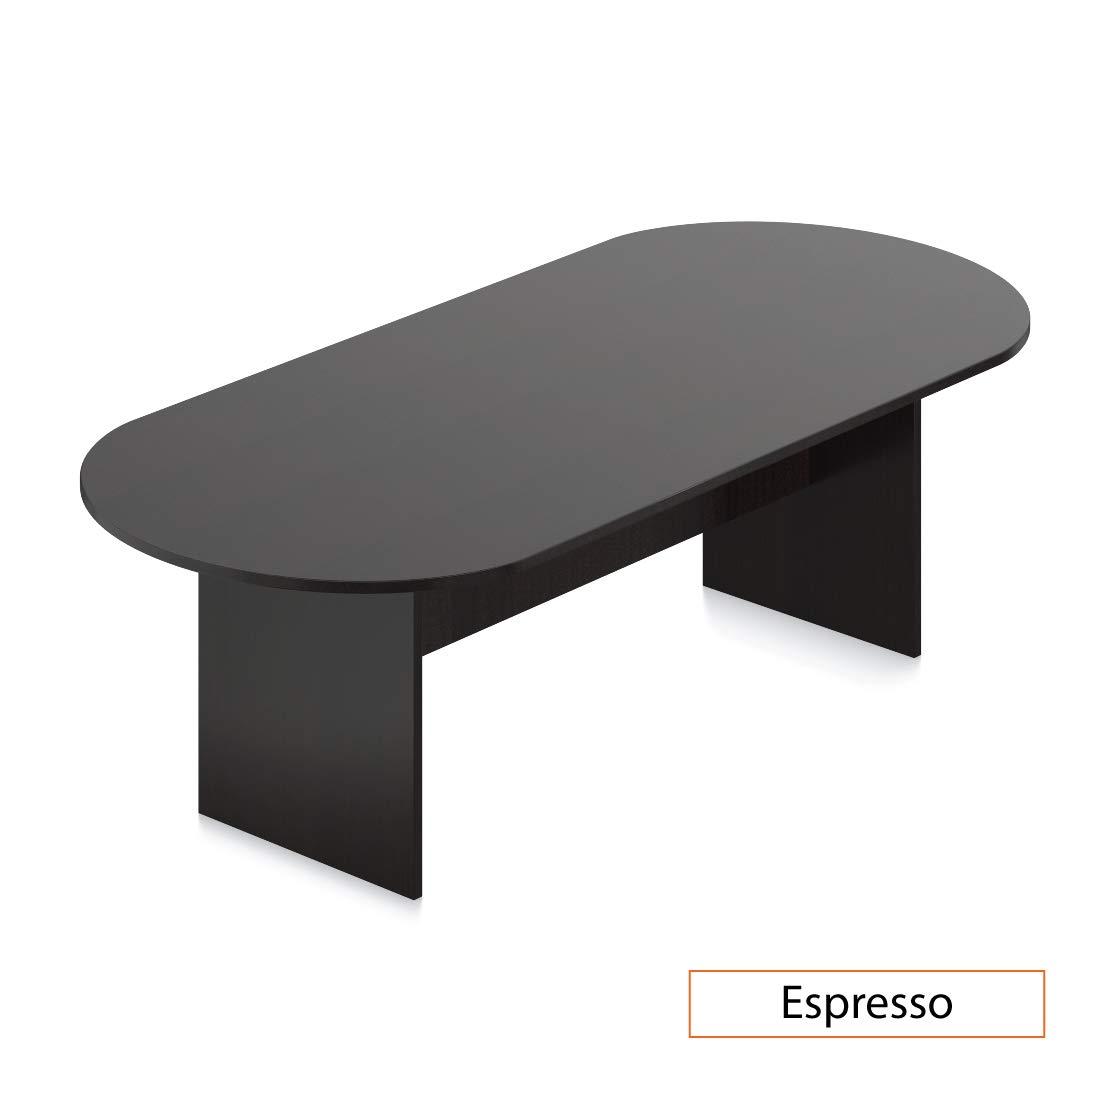 GOF 6FT, 8FT, 10FT Conference Table Chair (G10900B) Set, Cherry, Espresso, Mahogany, Walnut, Artisan Grey (8FT, Espresso)